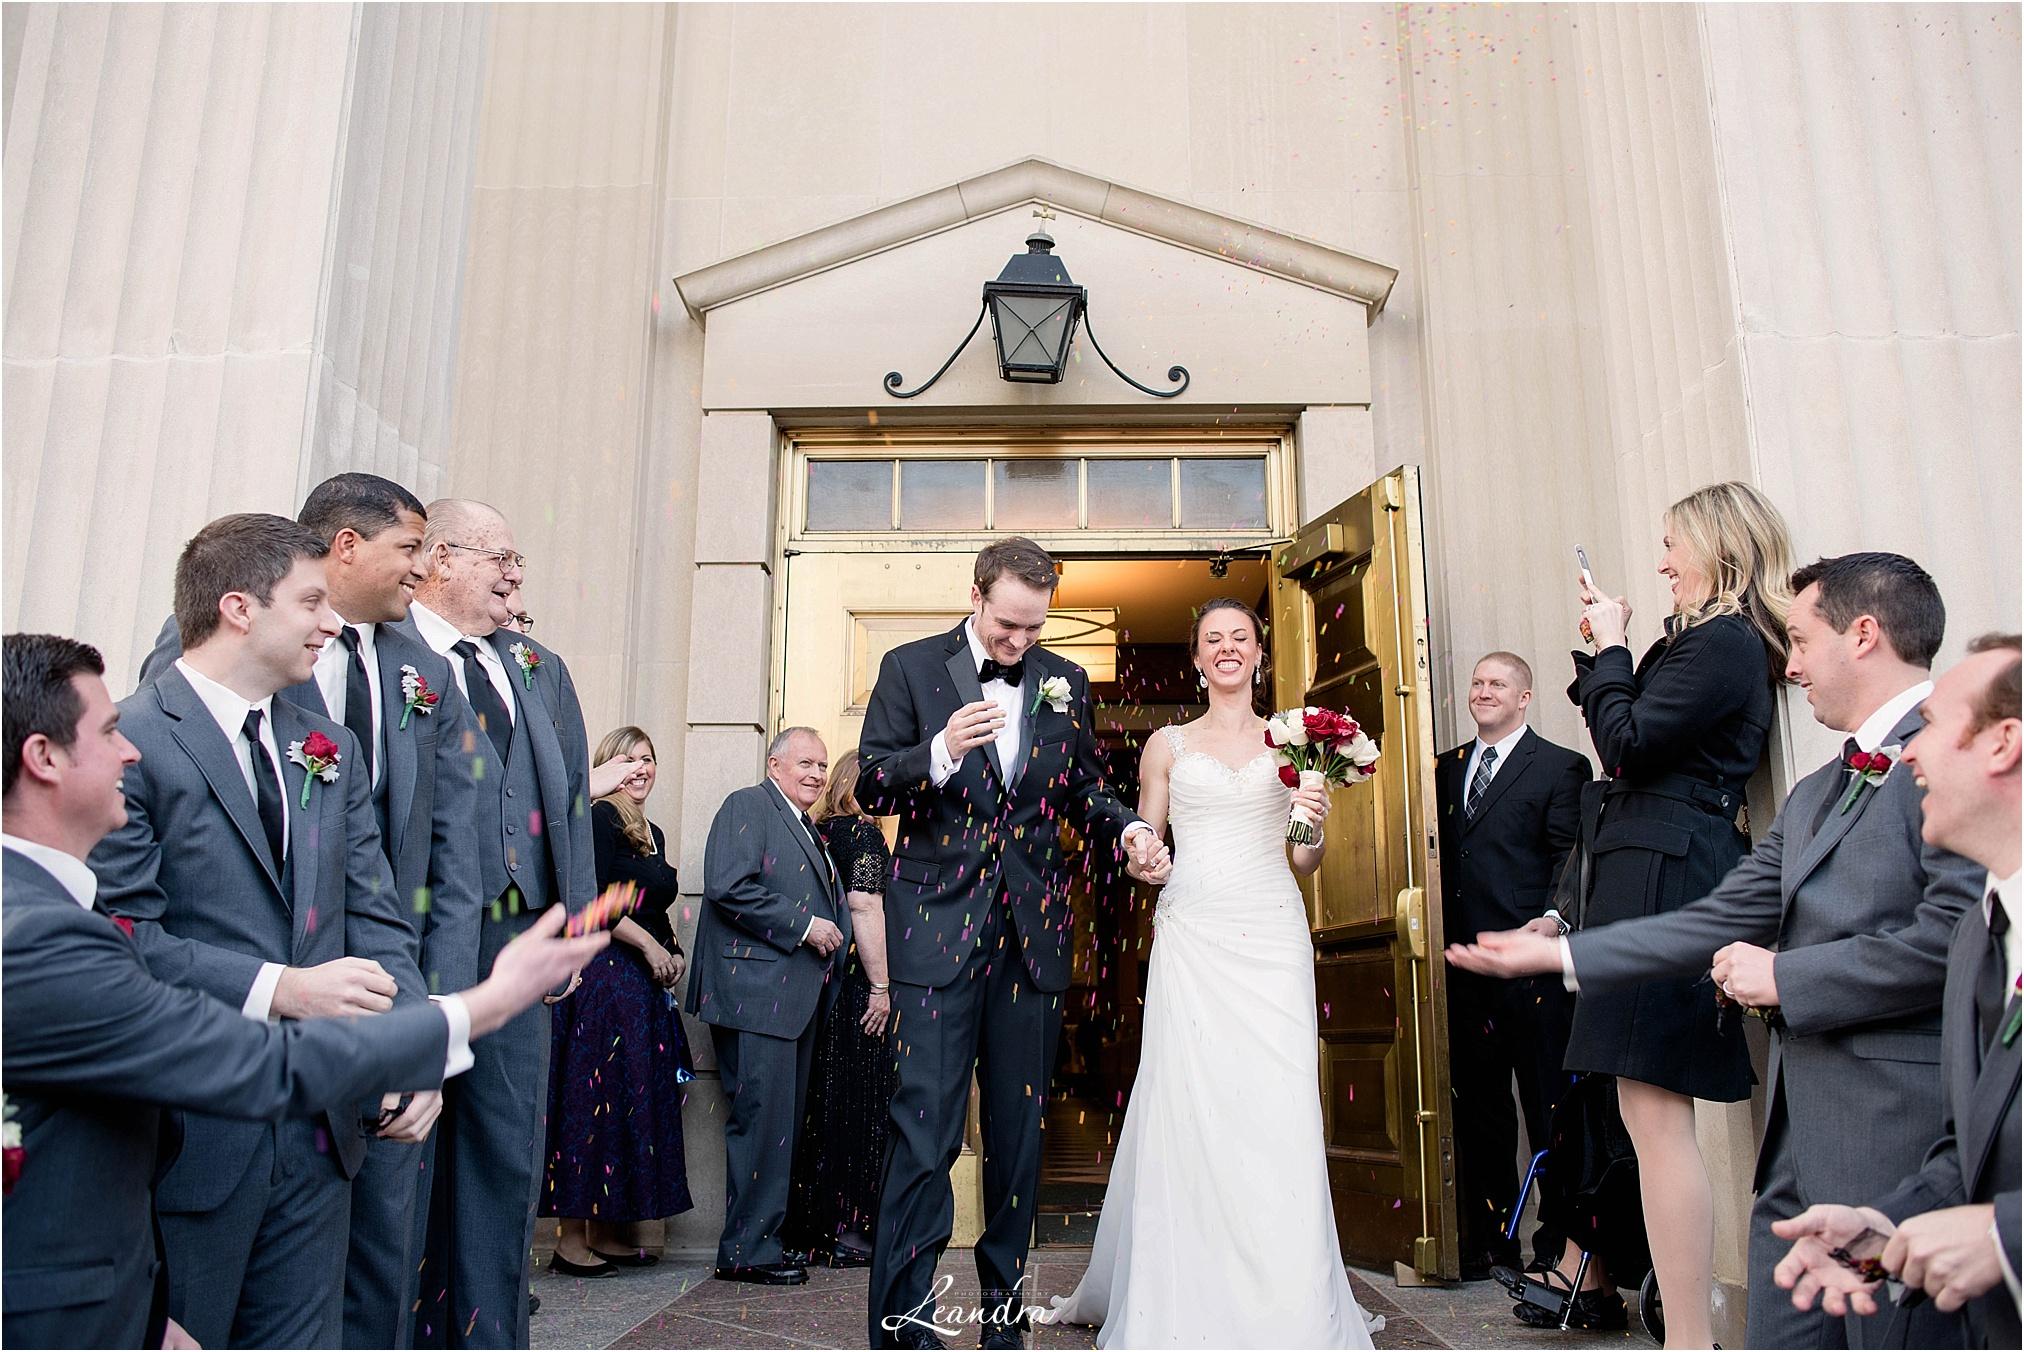 Stonebridge Country Club Wedding, Confetti exit_0027.jpg